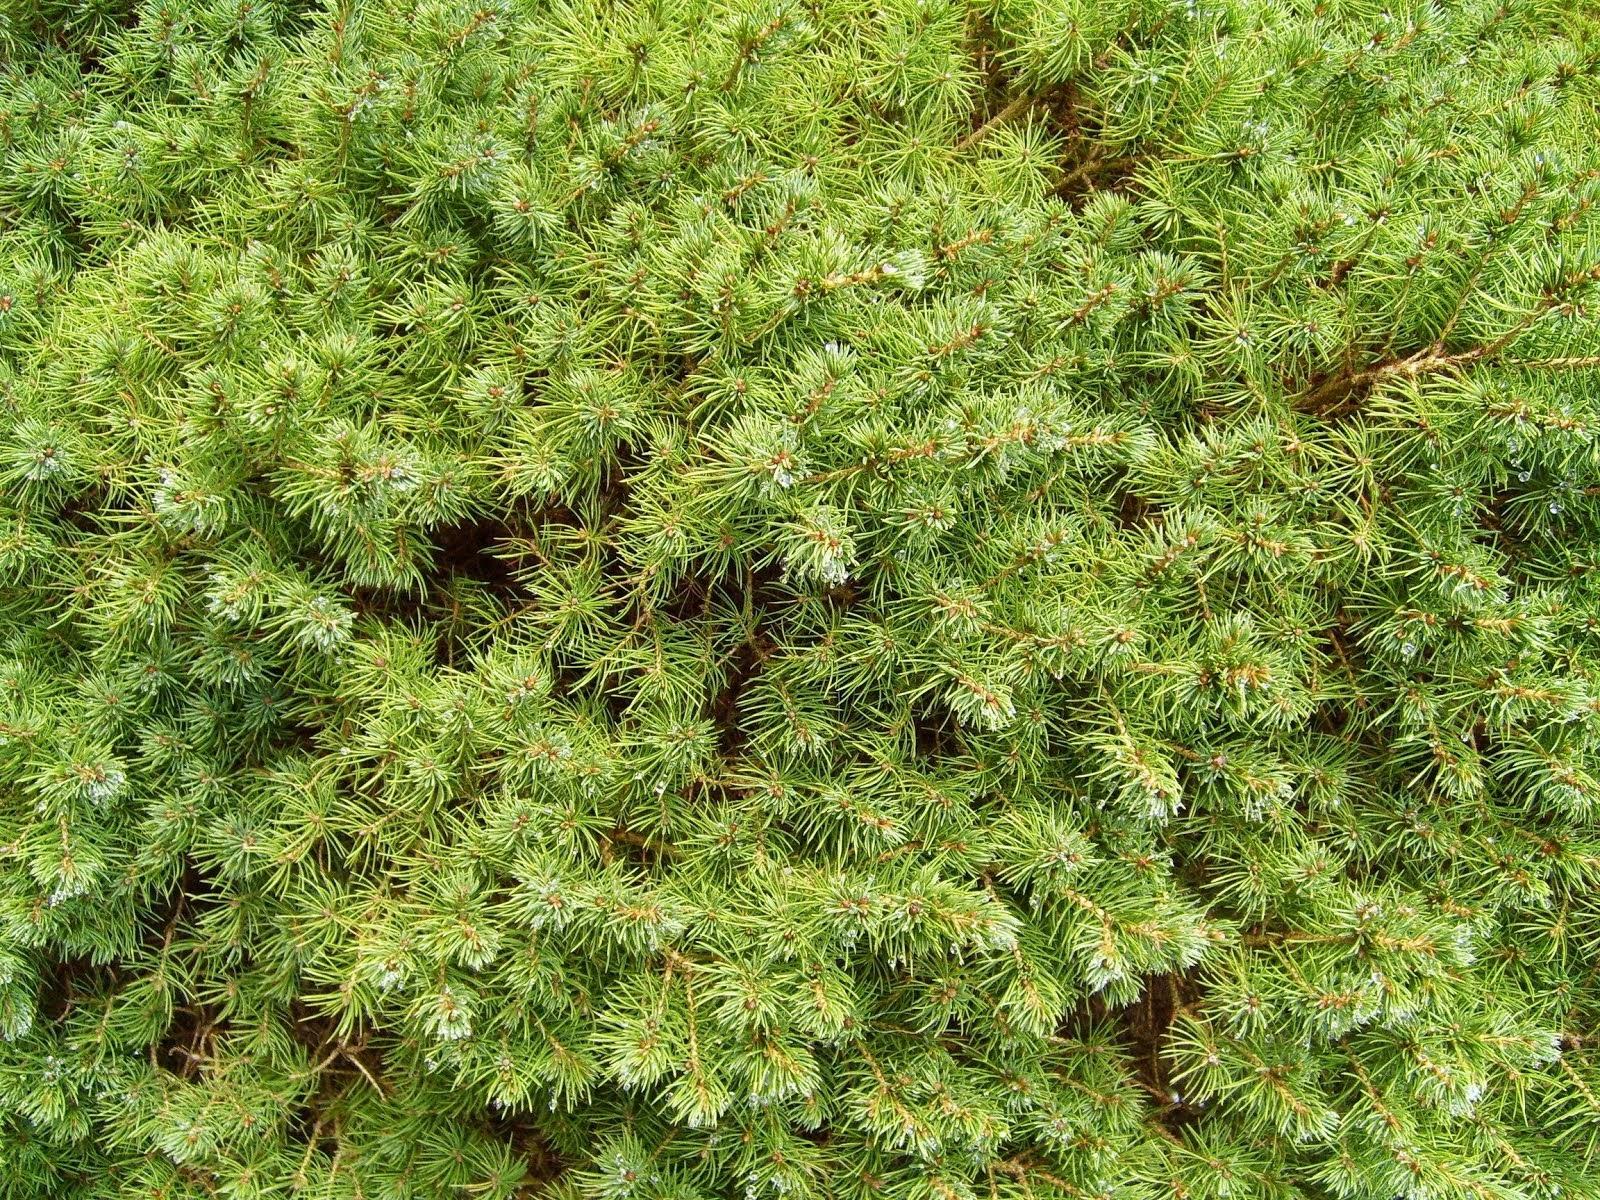 free stock photos: Leaves Plants Green Ground Bush Texture ...